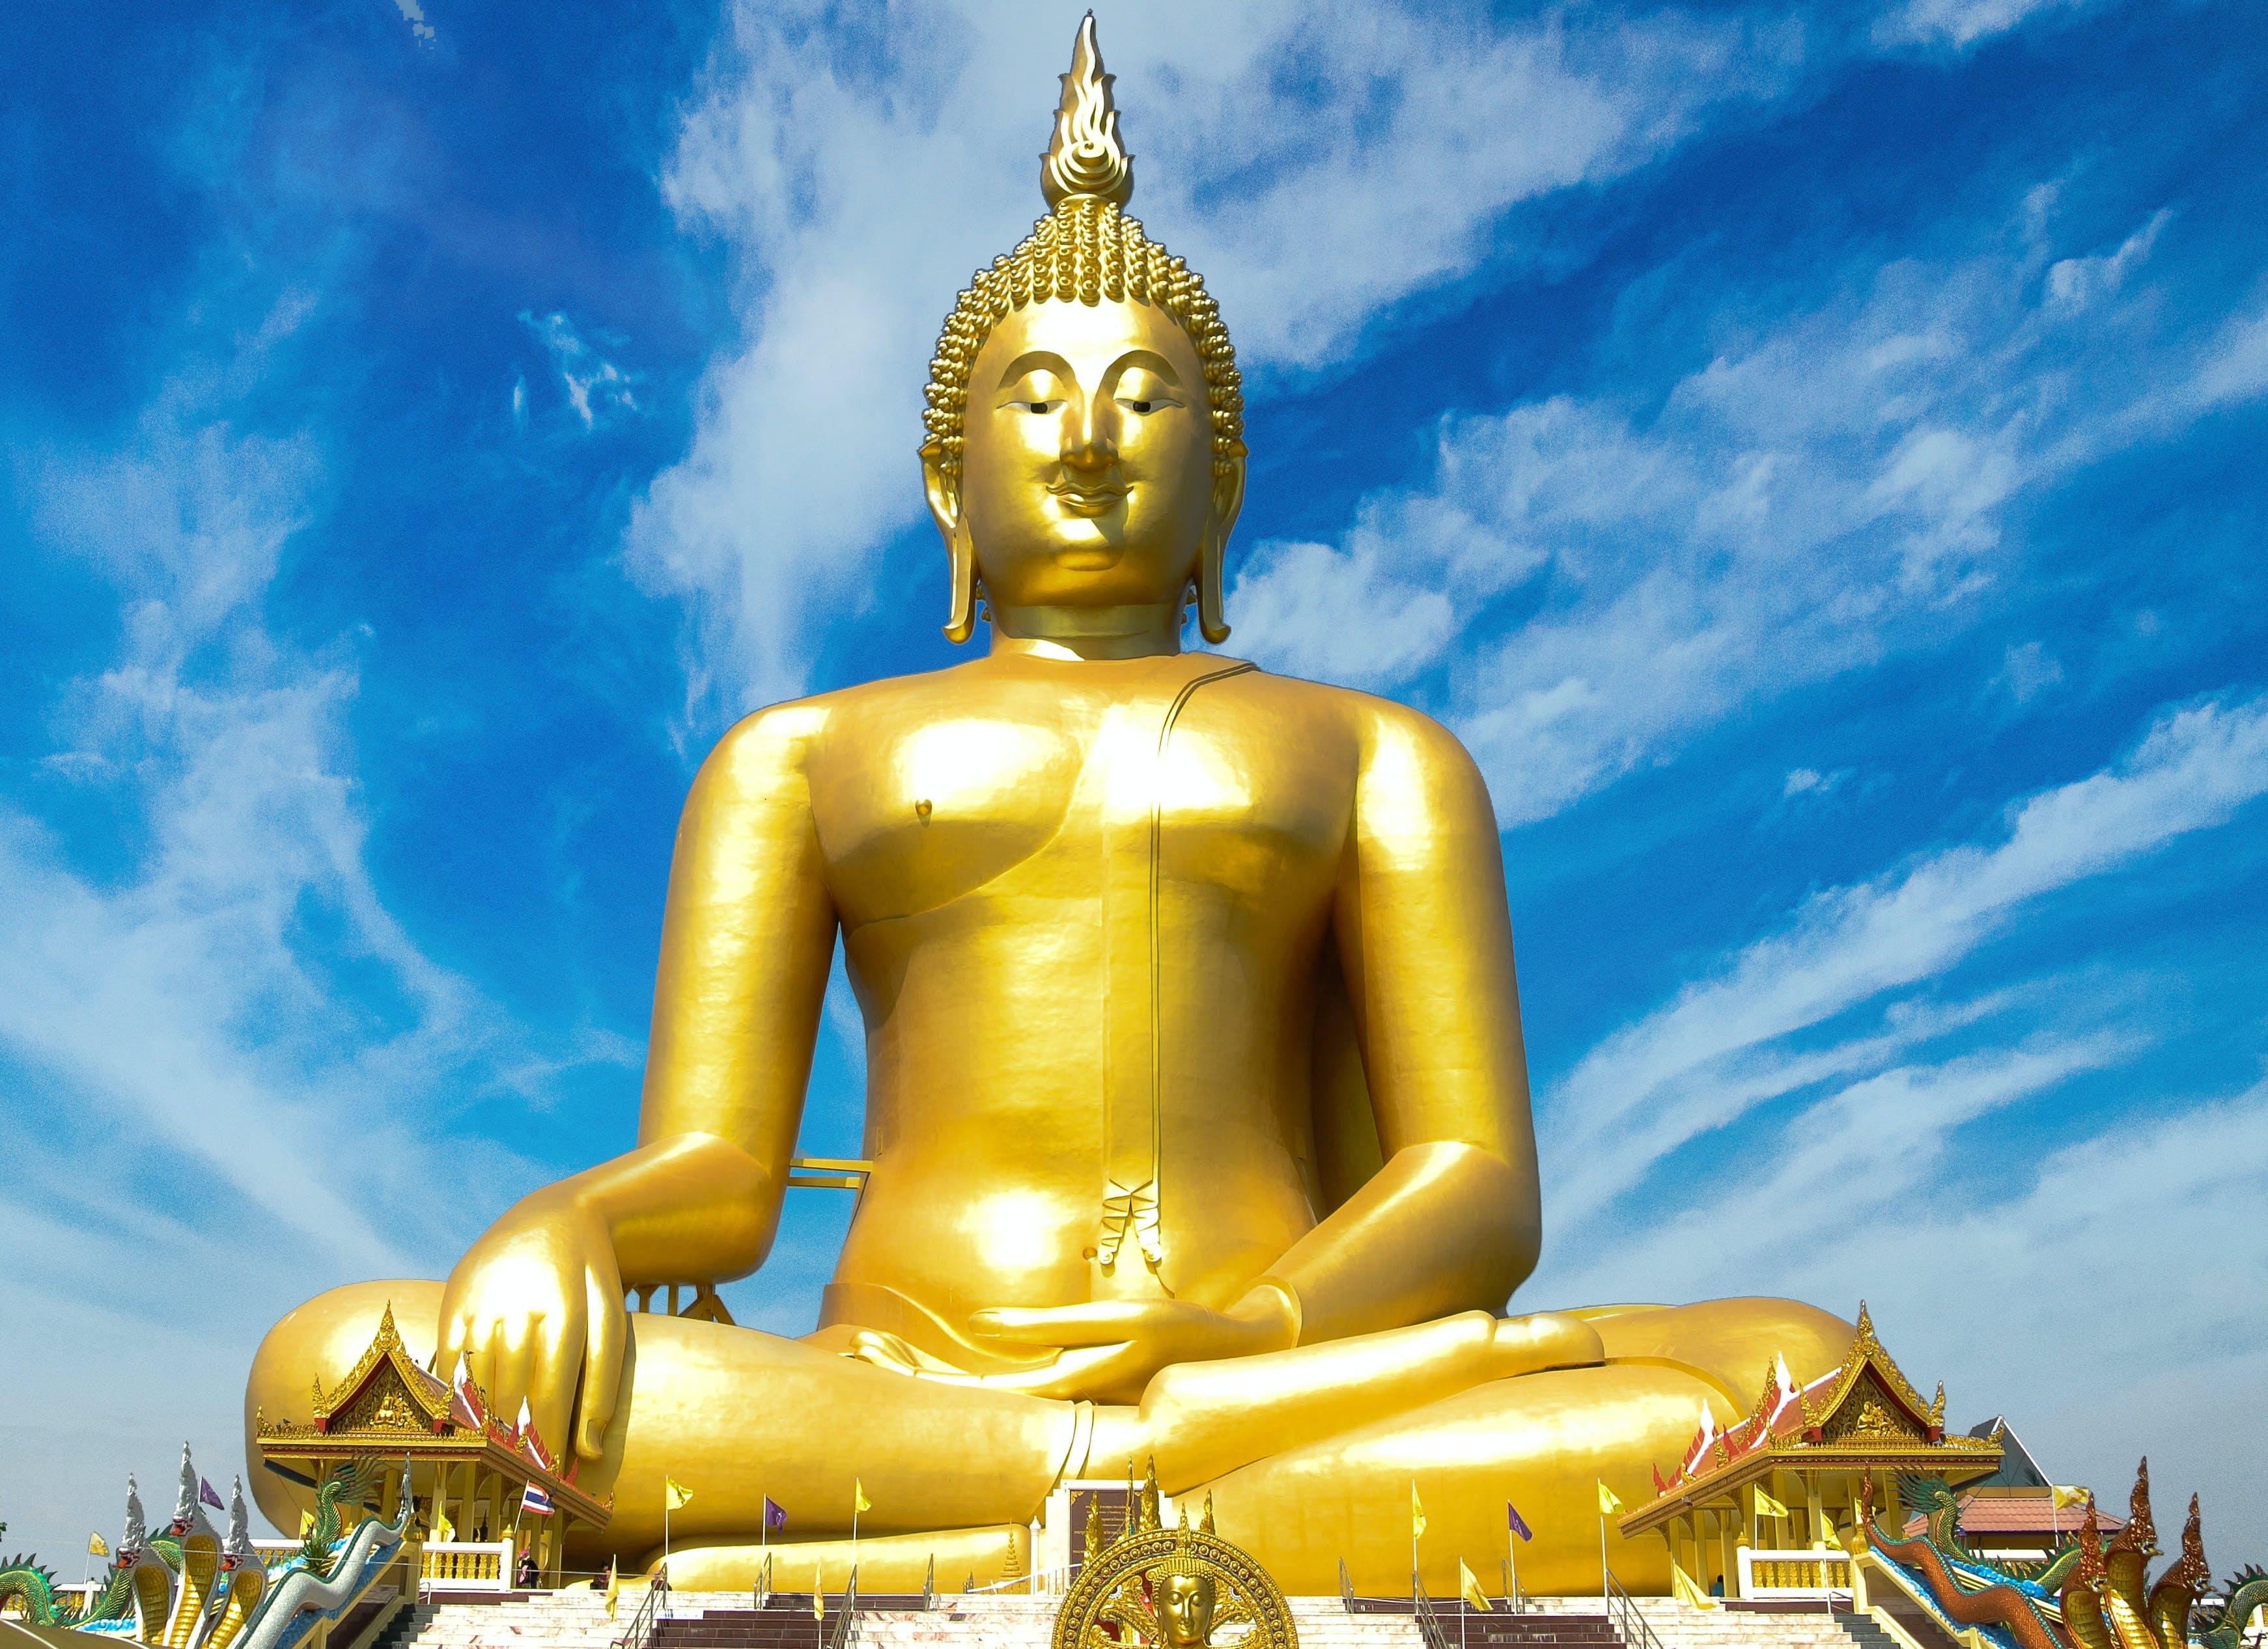 Gold Religious Statue